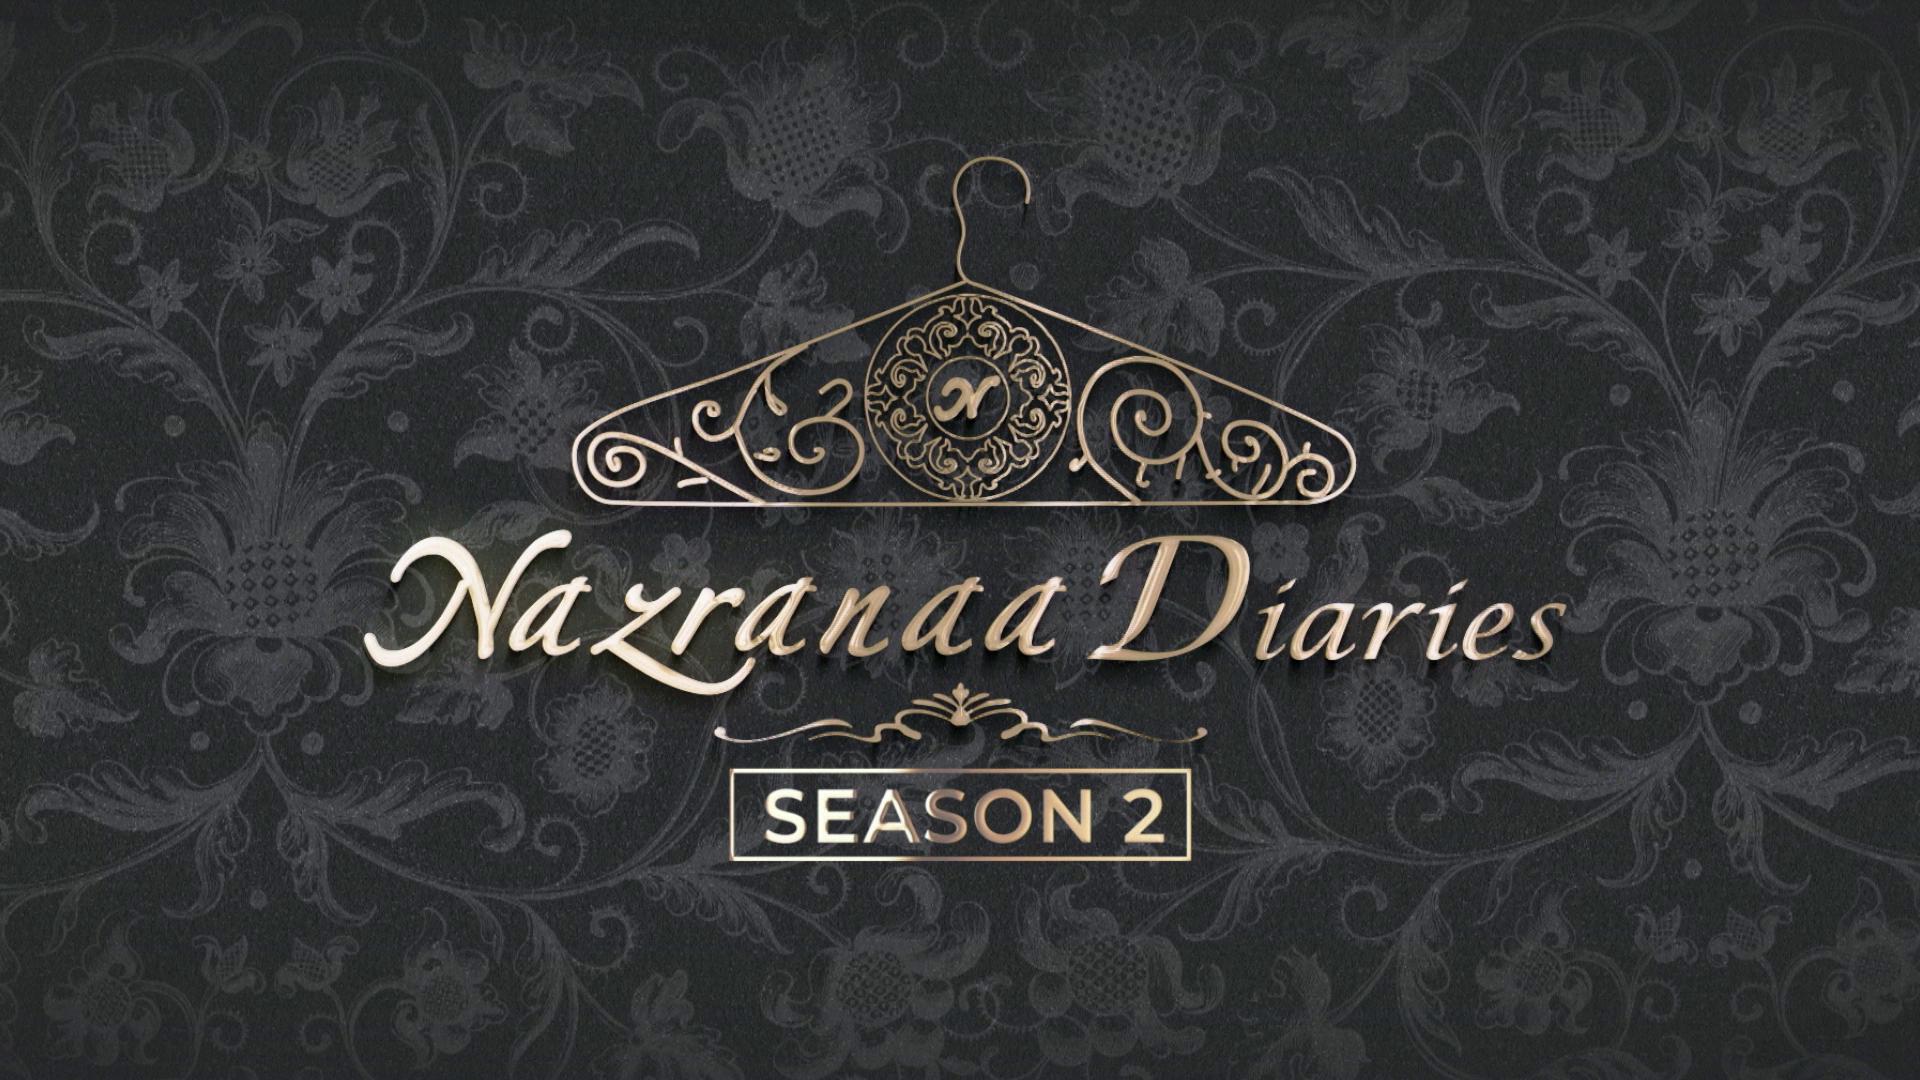 Nazranaa Diaries Season 2 Episode 01